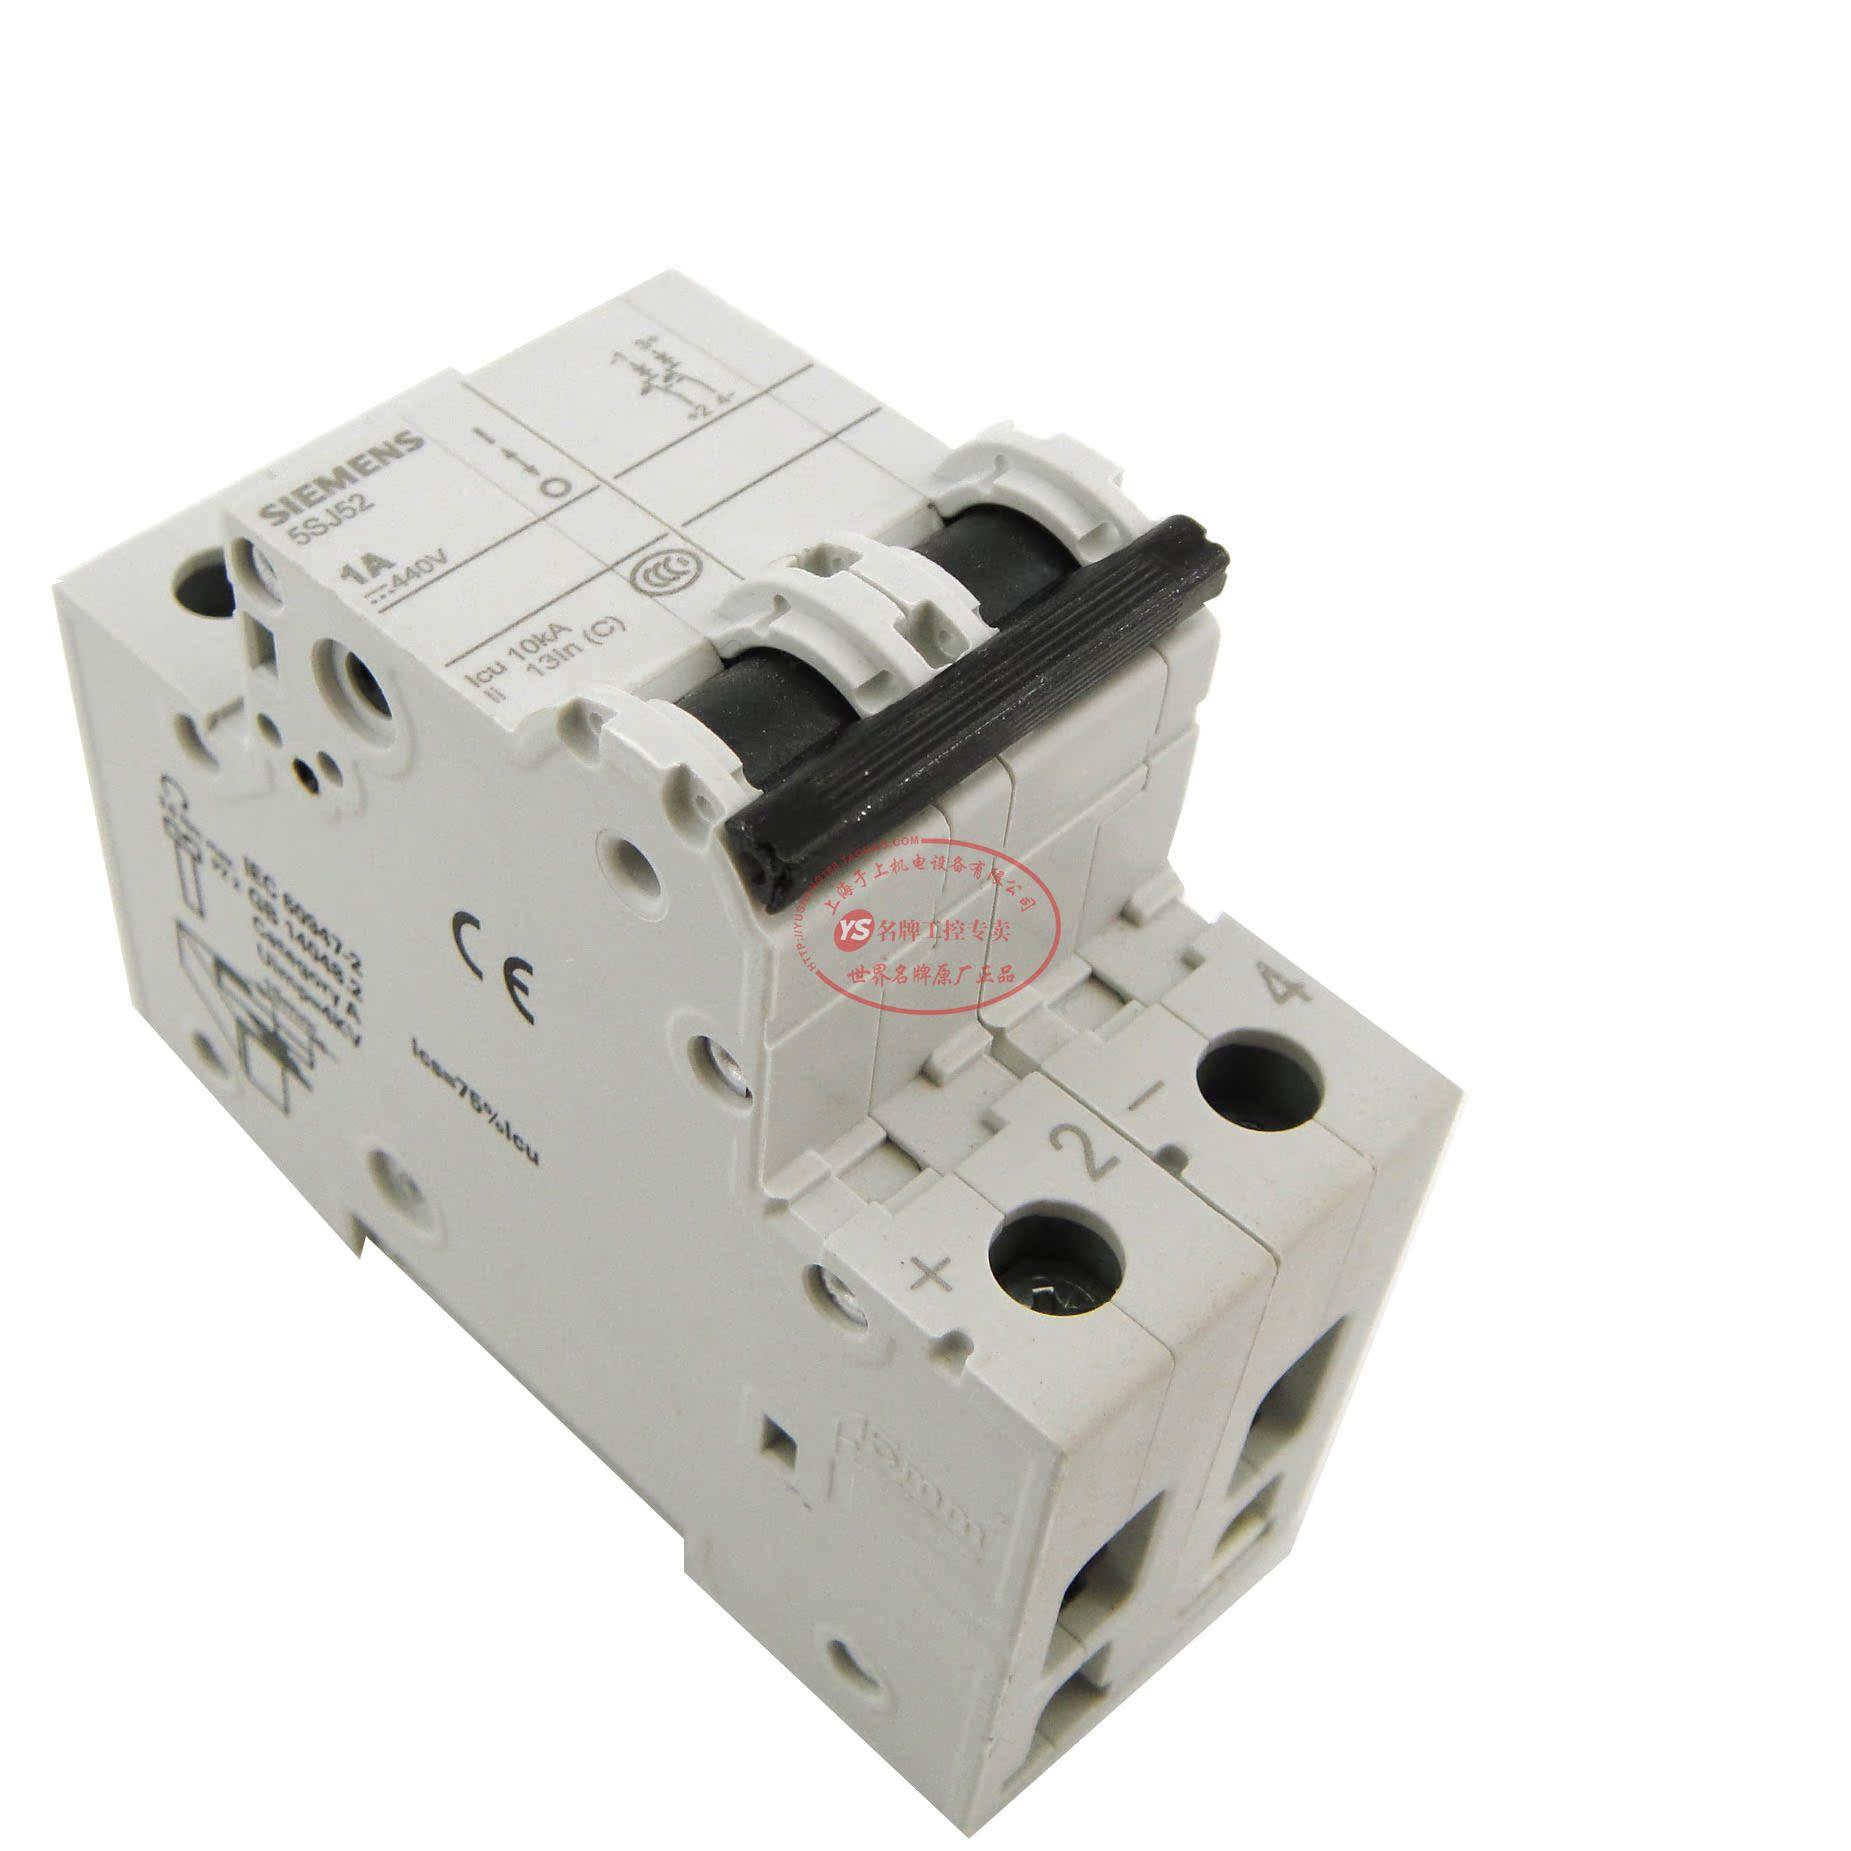 Автоматический выключатель Siemens 5SJ5201-7CC20 1PC1A siemens lc67bf532